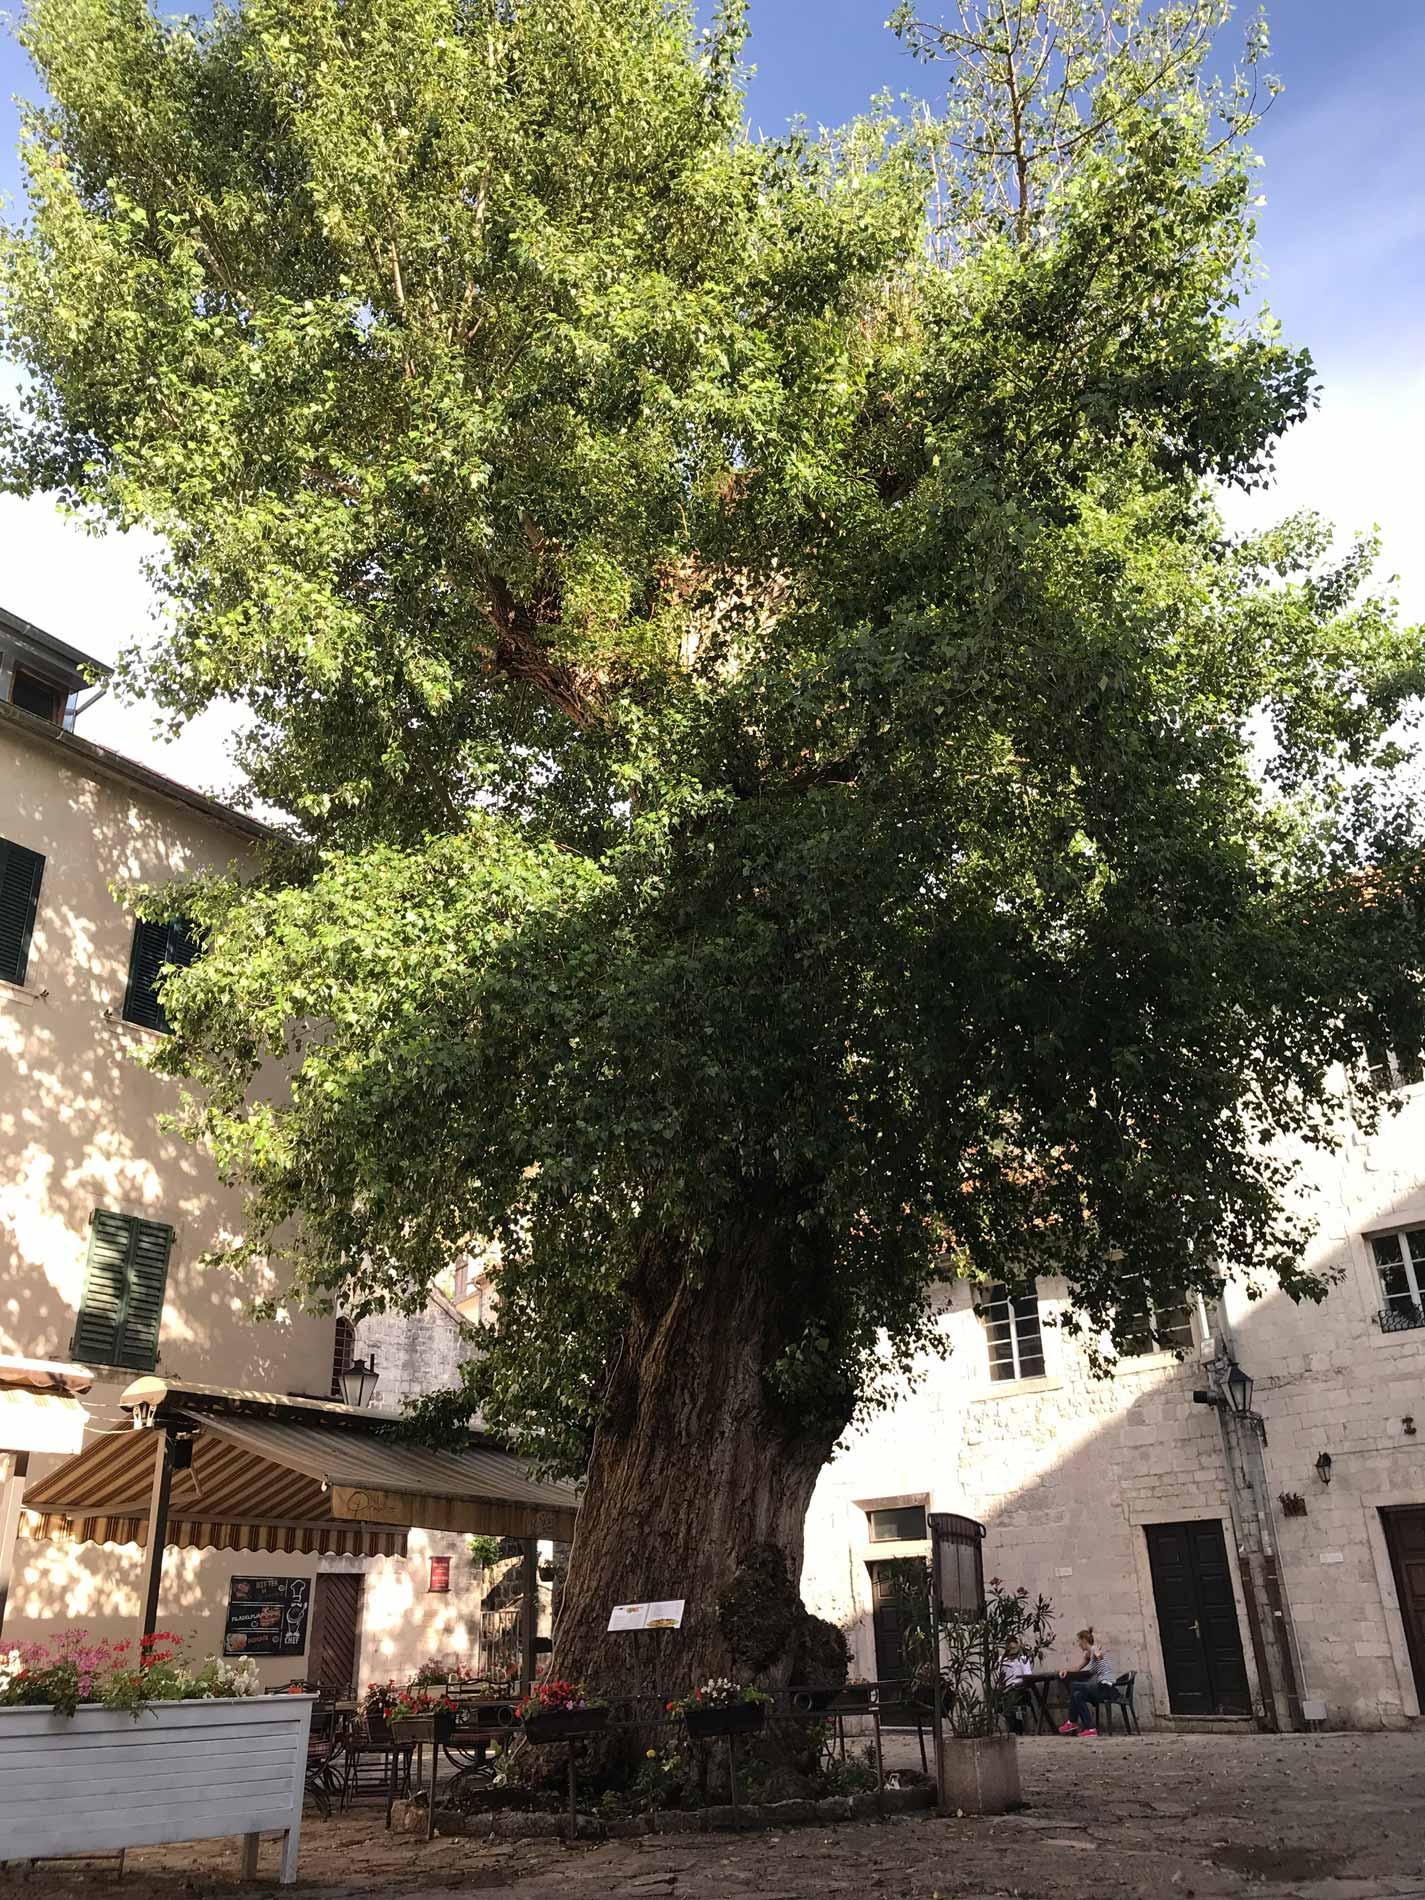 Kotor-Montenegro-Ulica1-albero-Pjaca-od-kina-cats-museum